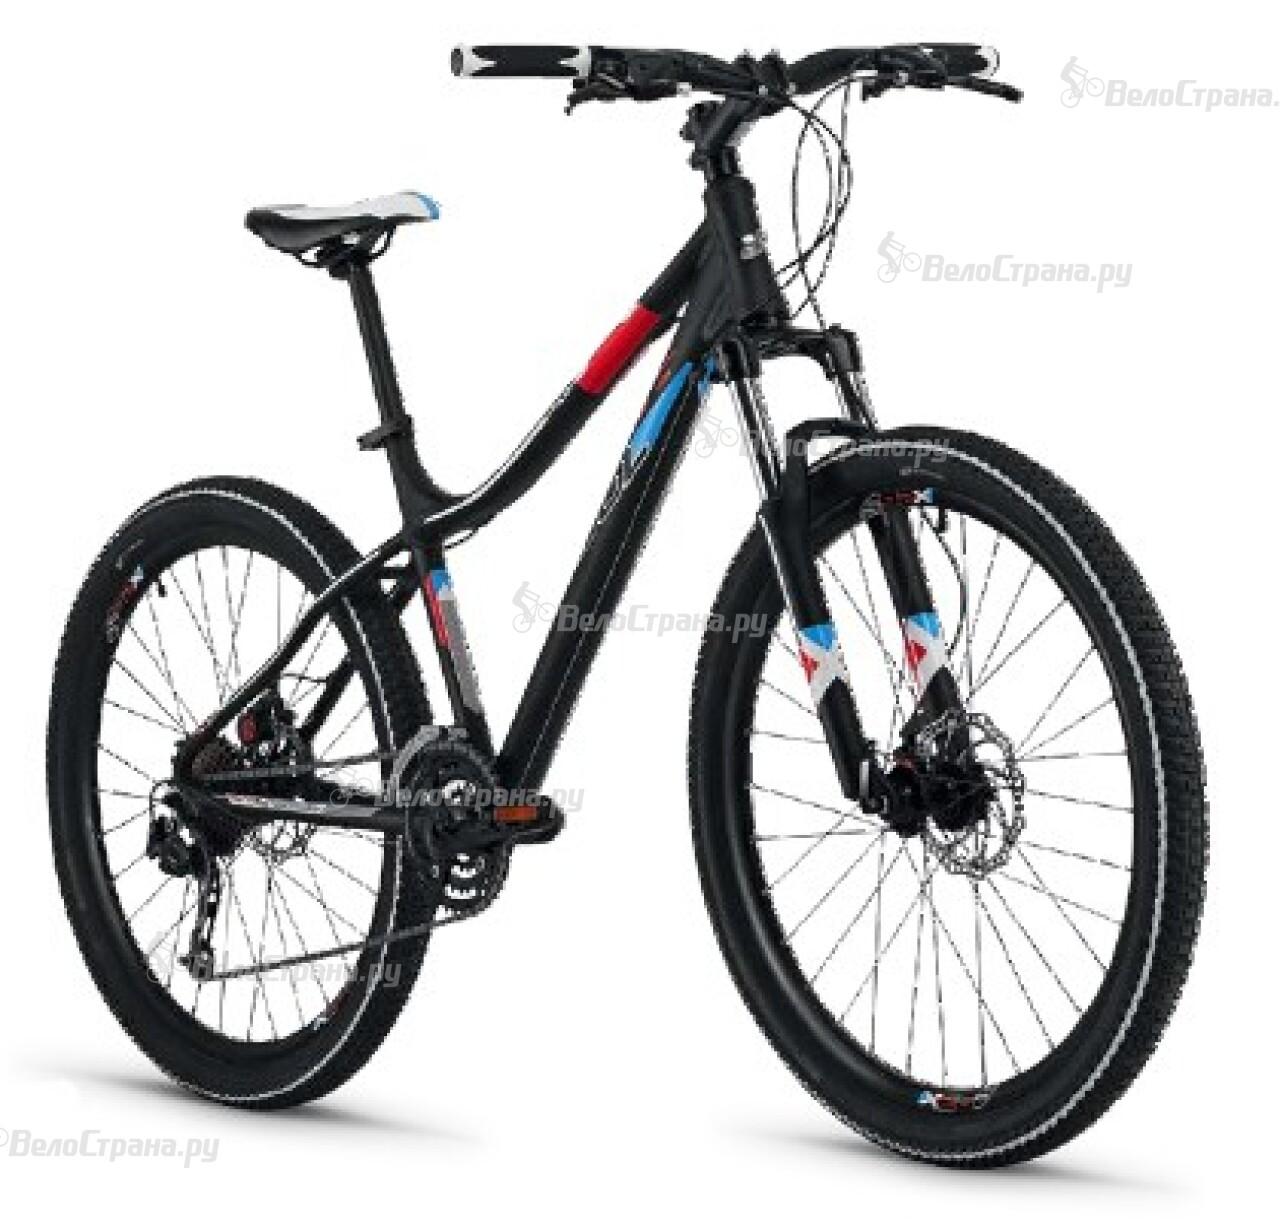 Велосипед Scool troX 26 27S (2014)